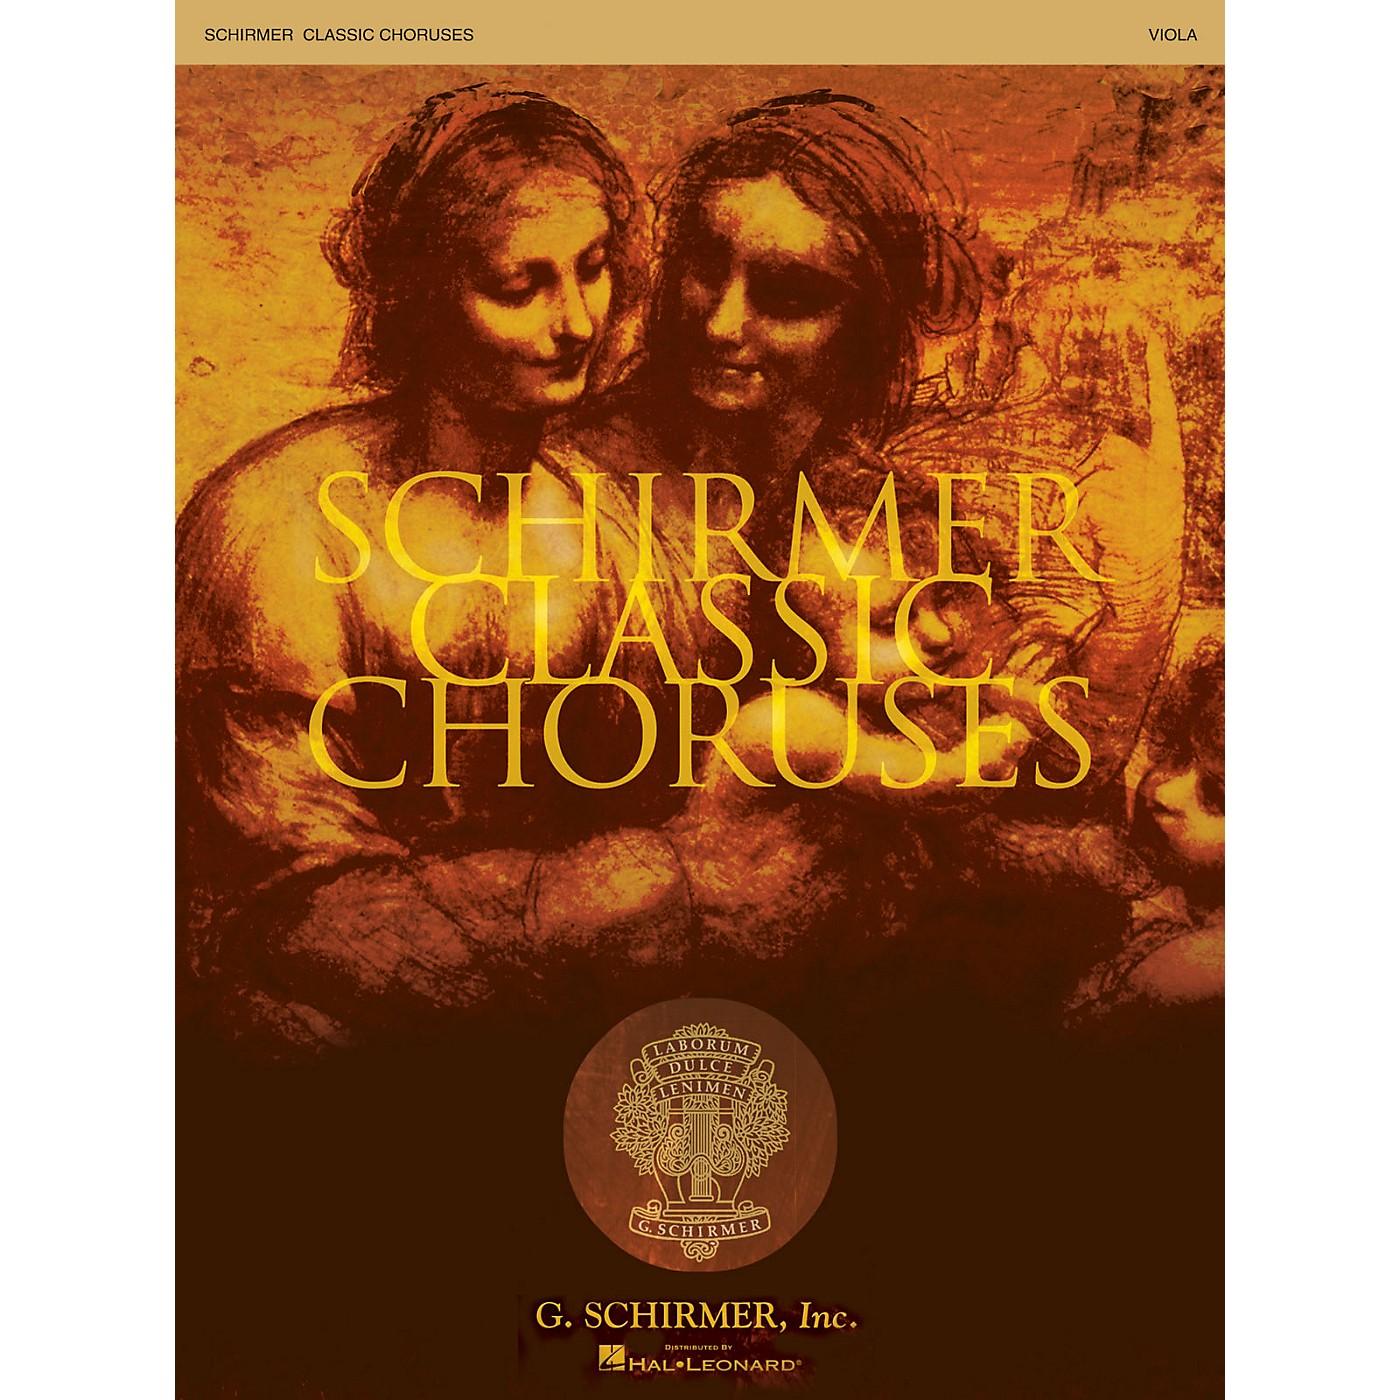 G. Schirmer Schirmer Classic Choruses (Viola) arranged by Stan Pethel thumbnail